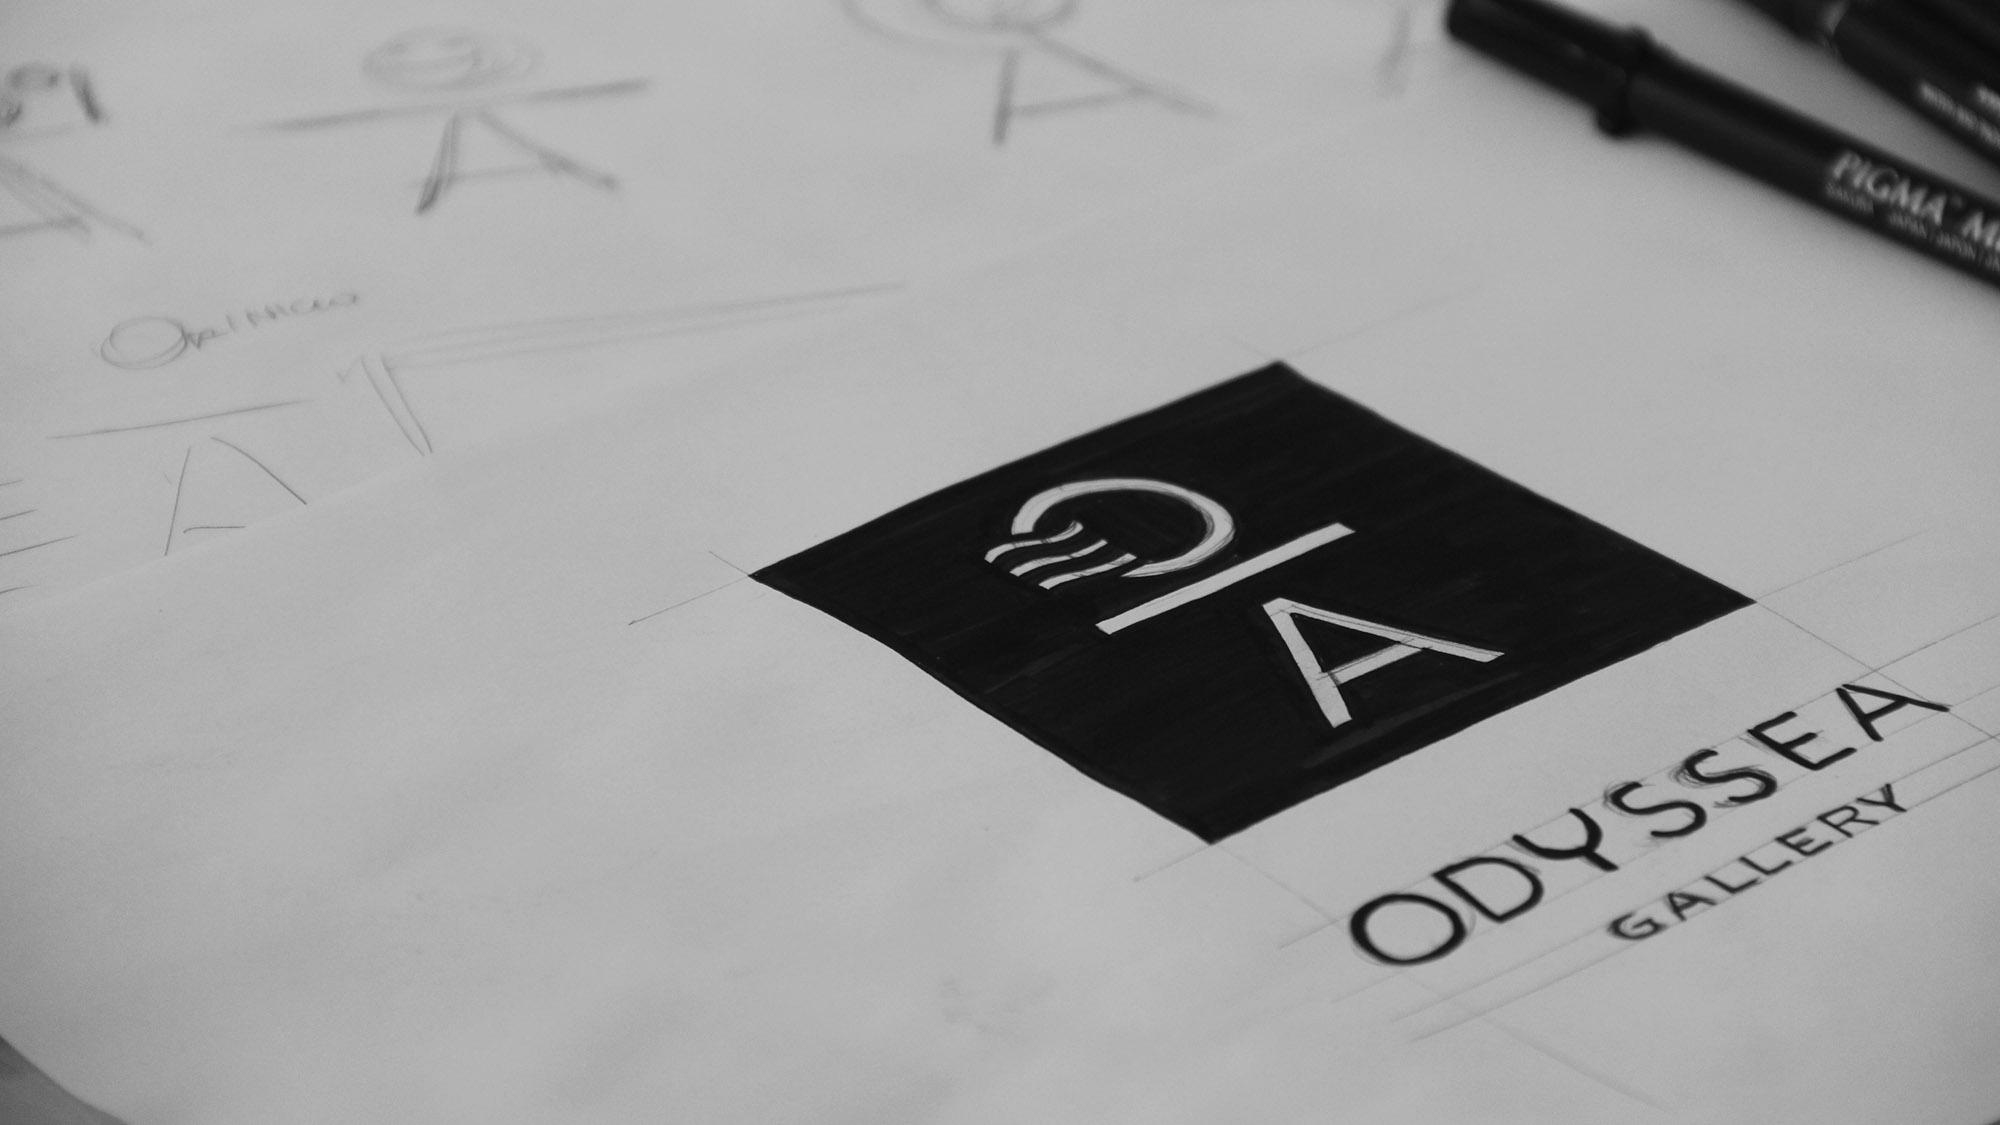 Rascunho do logo Odyssea